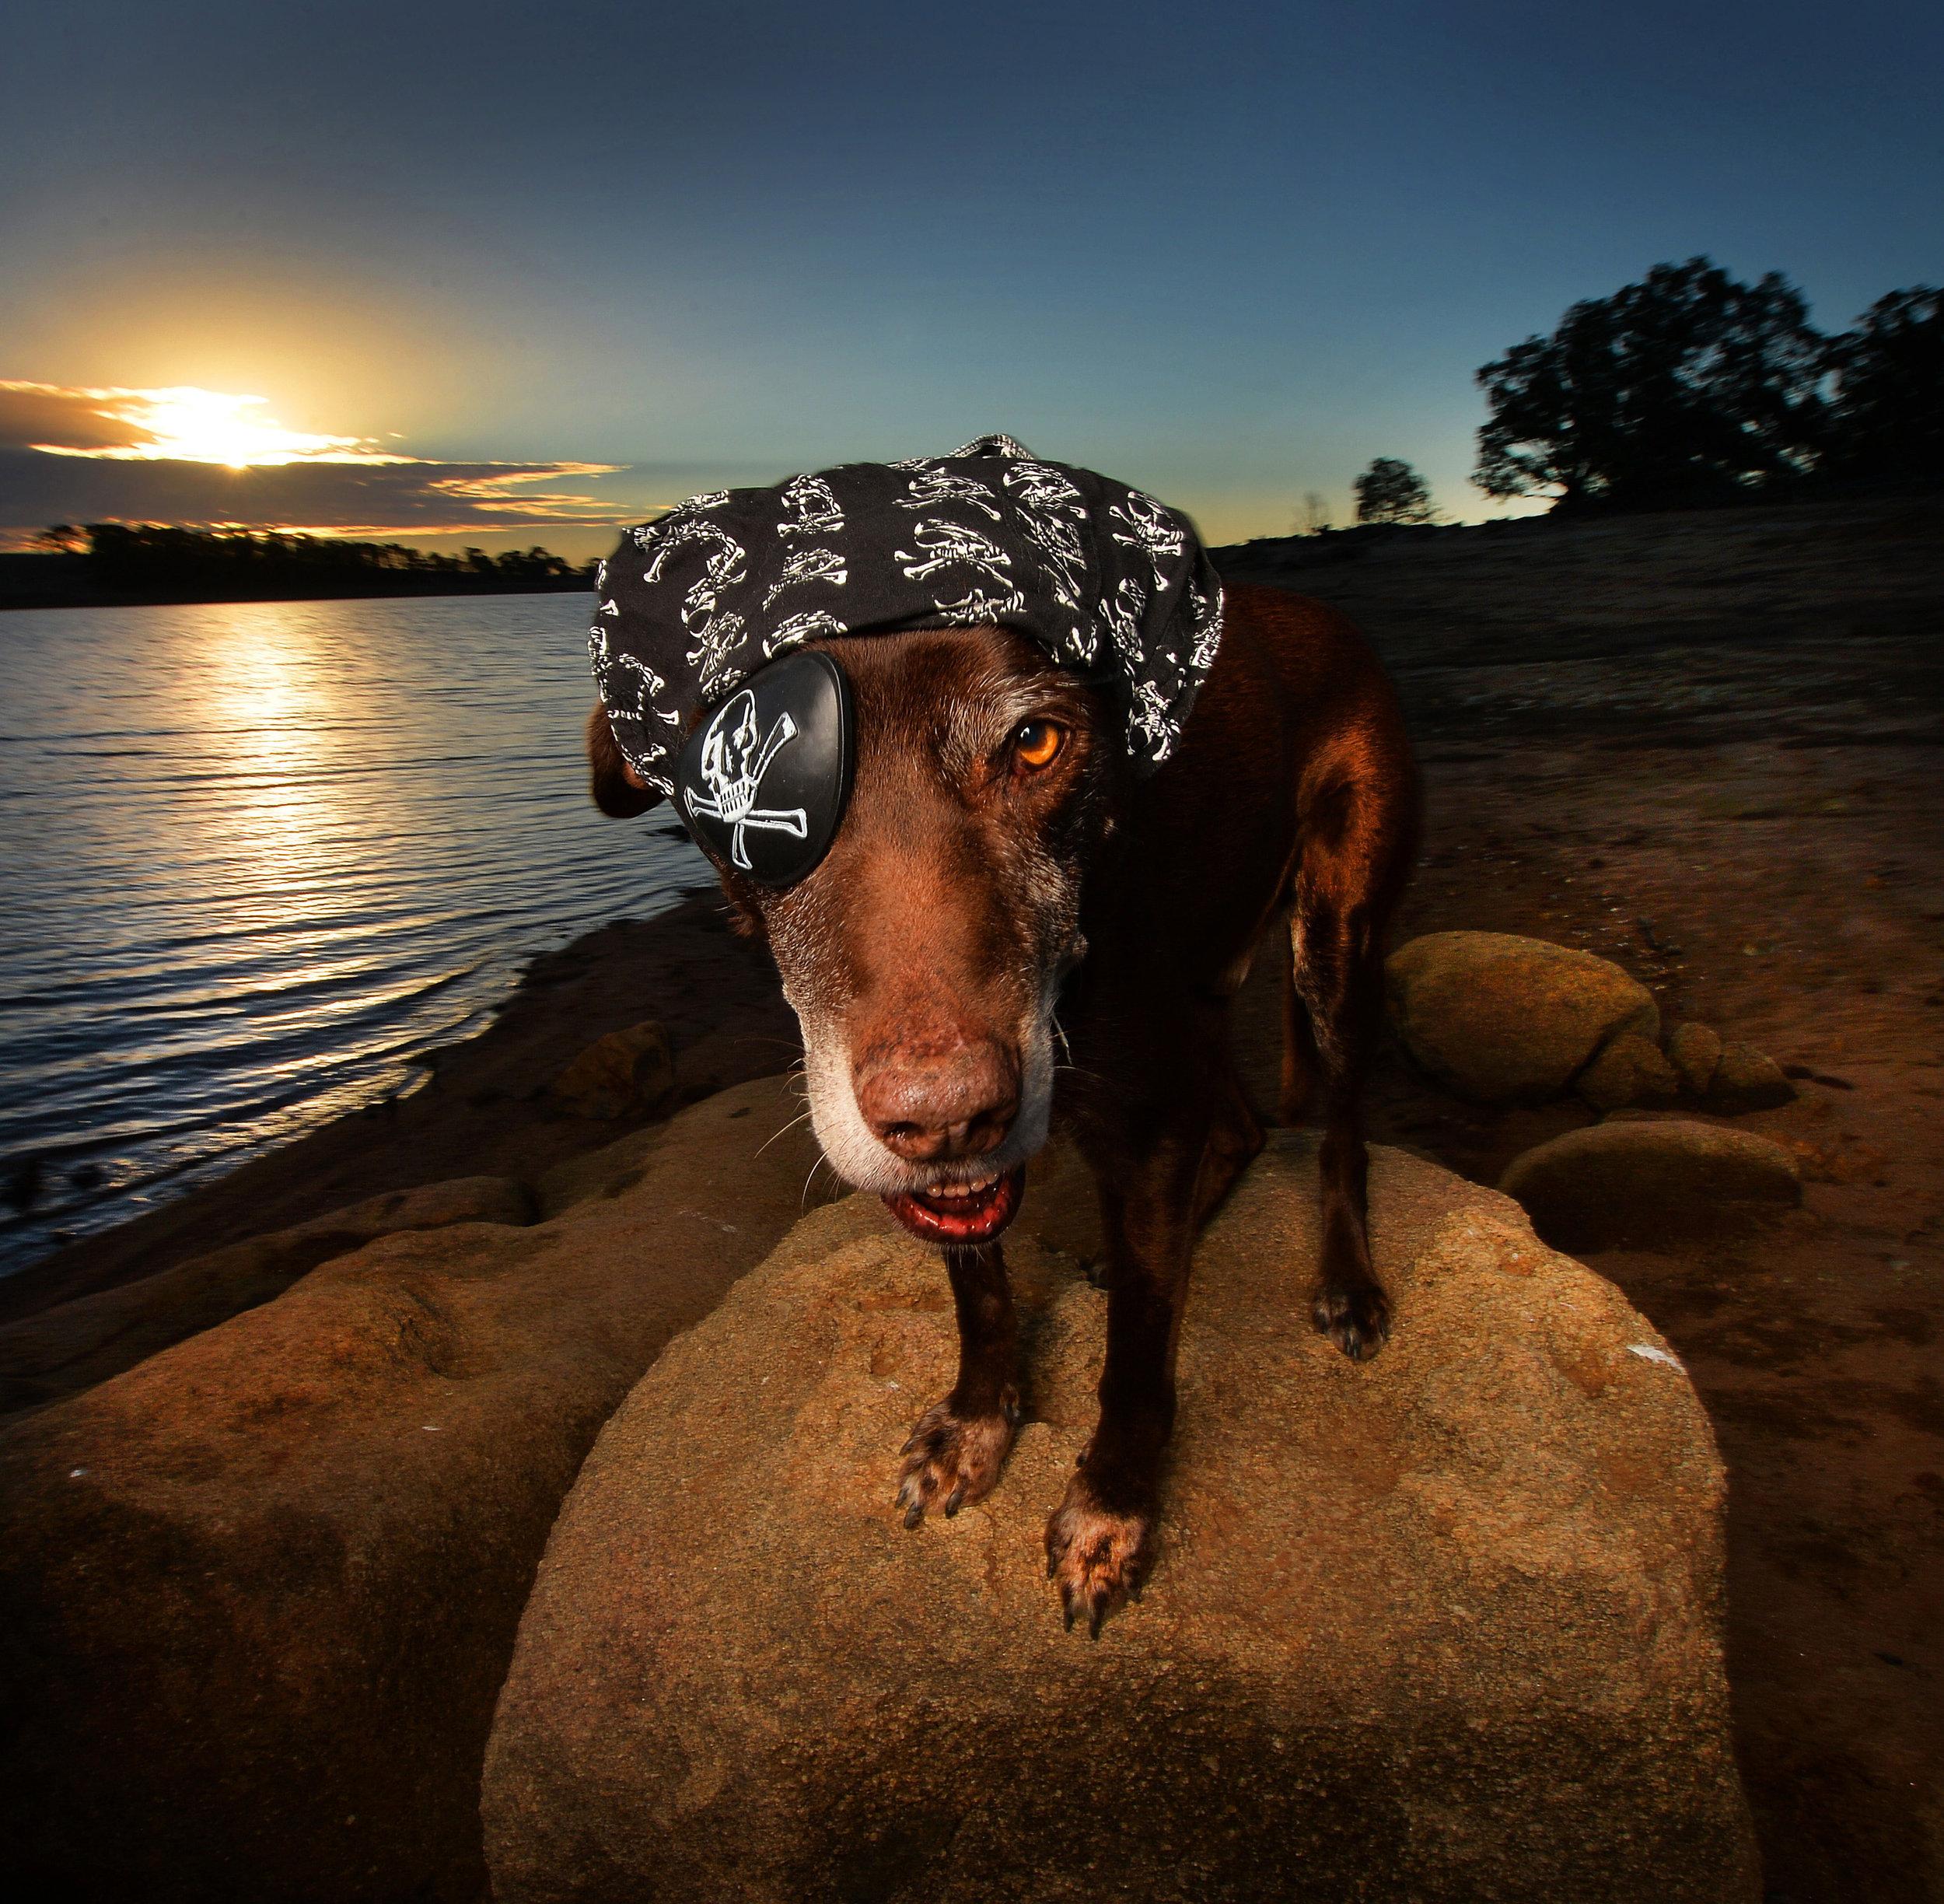 CHP_Export_114586275_Oscar the one eyed dogsurveys his domain at Cairn Curran ReservoirContact B.jpg